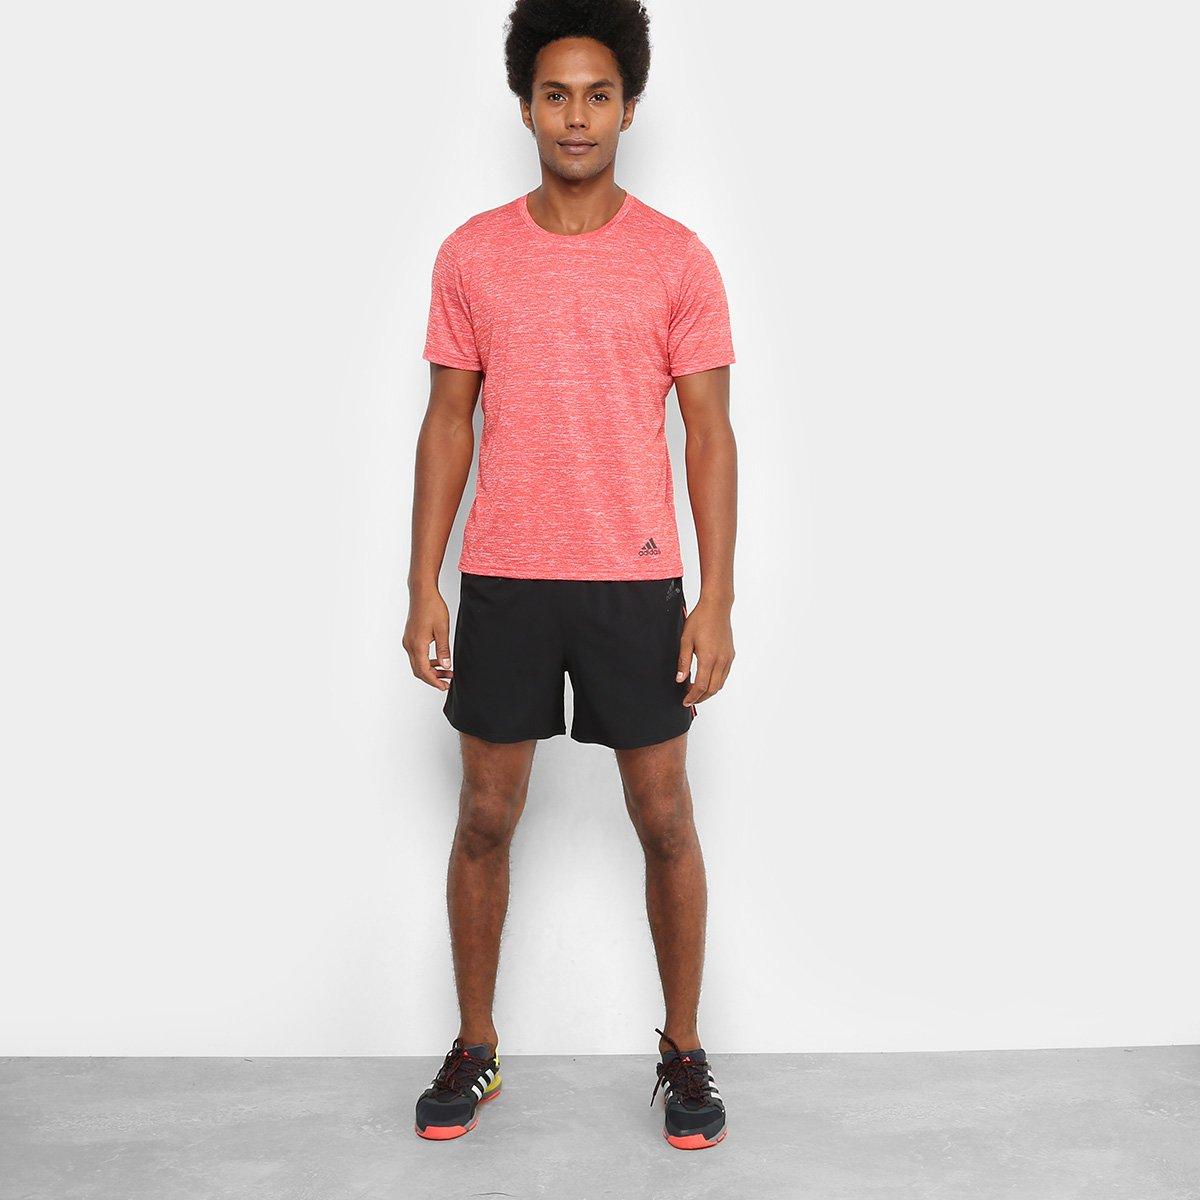 Camiseta Adidas Run Masculina - Compre Agora  38c1cc0db04bc